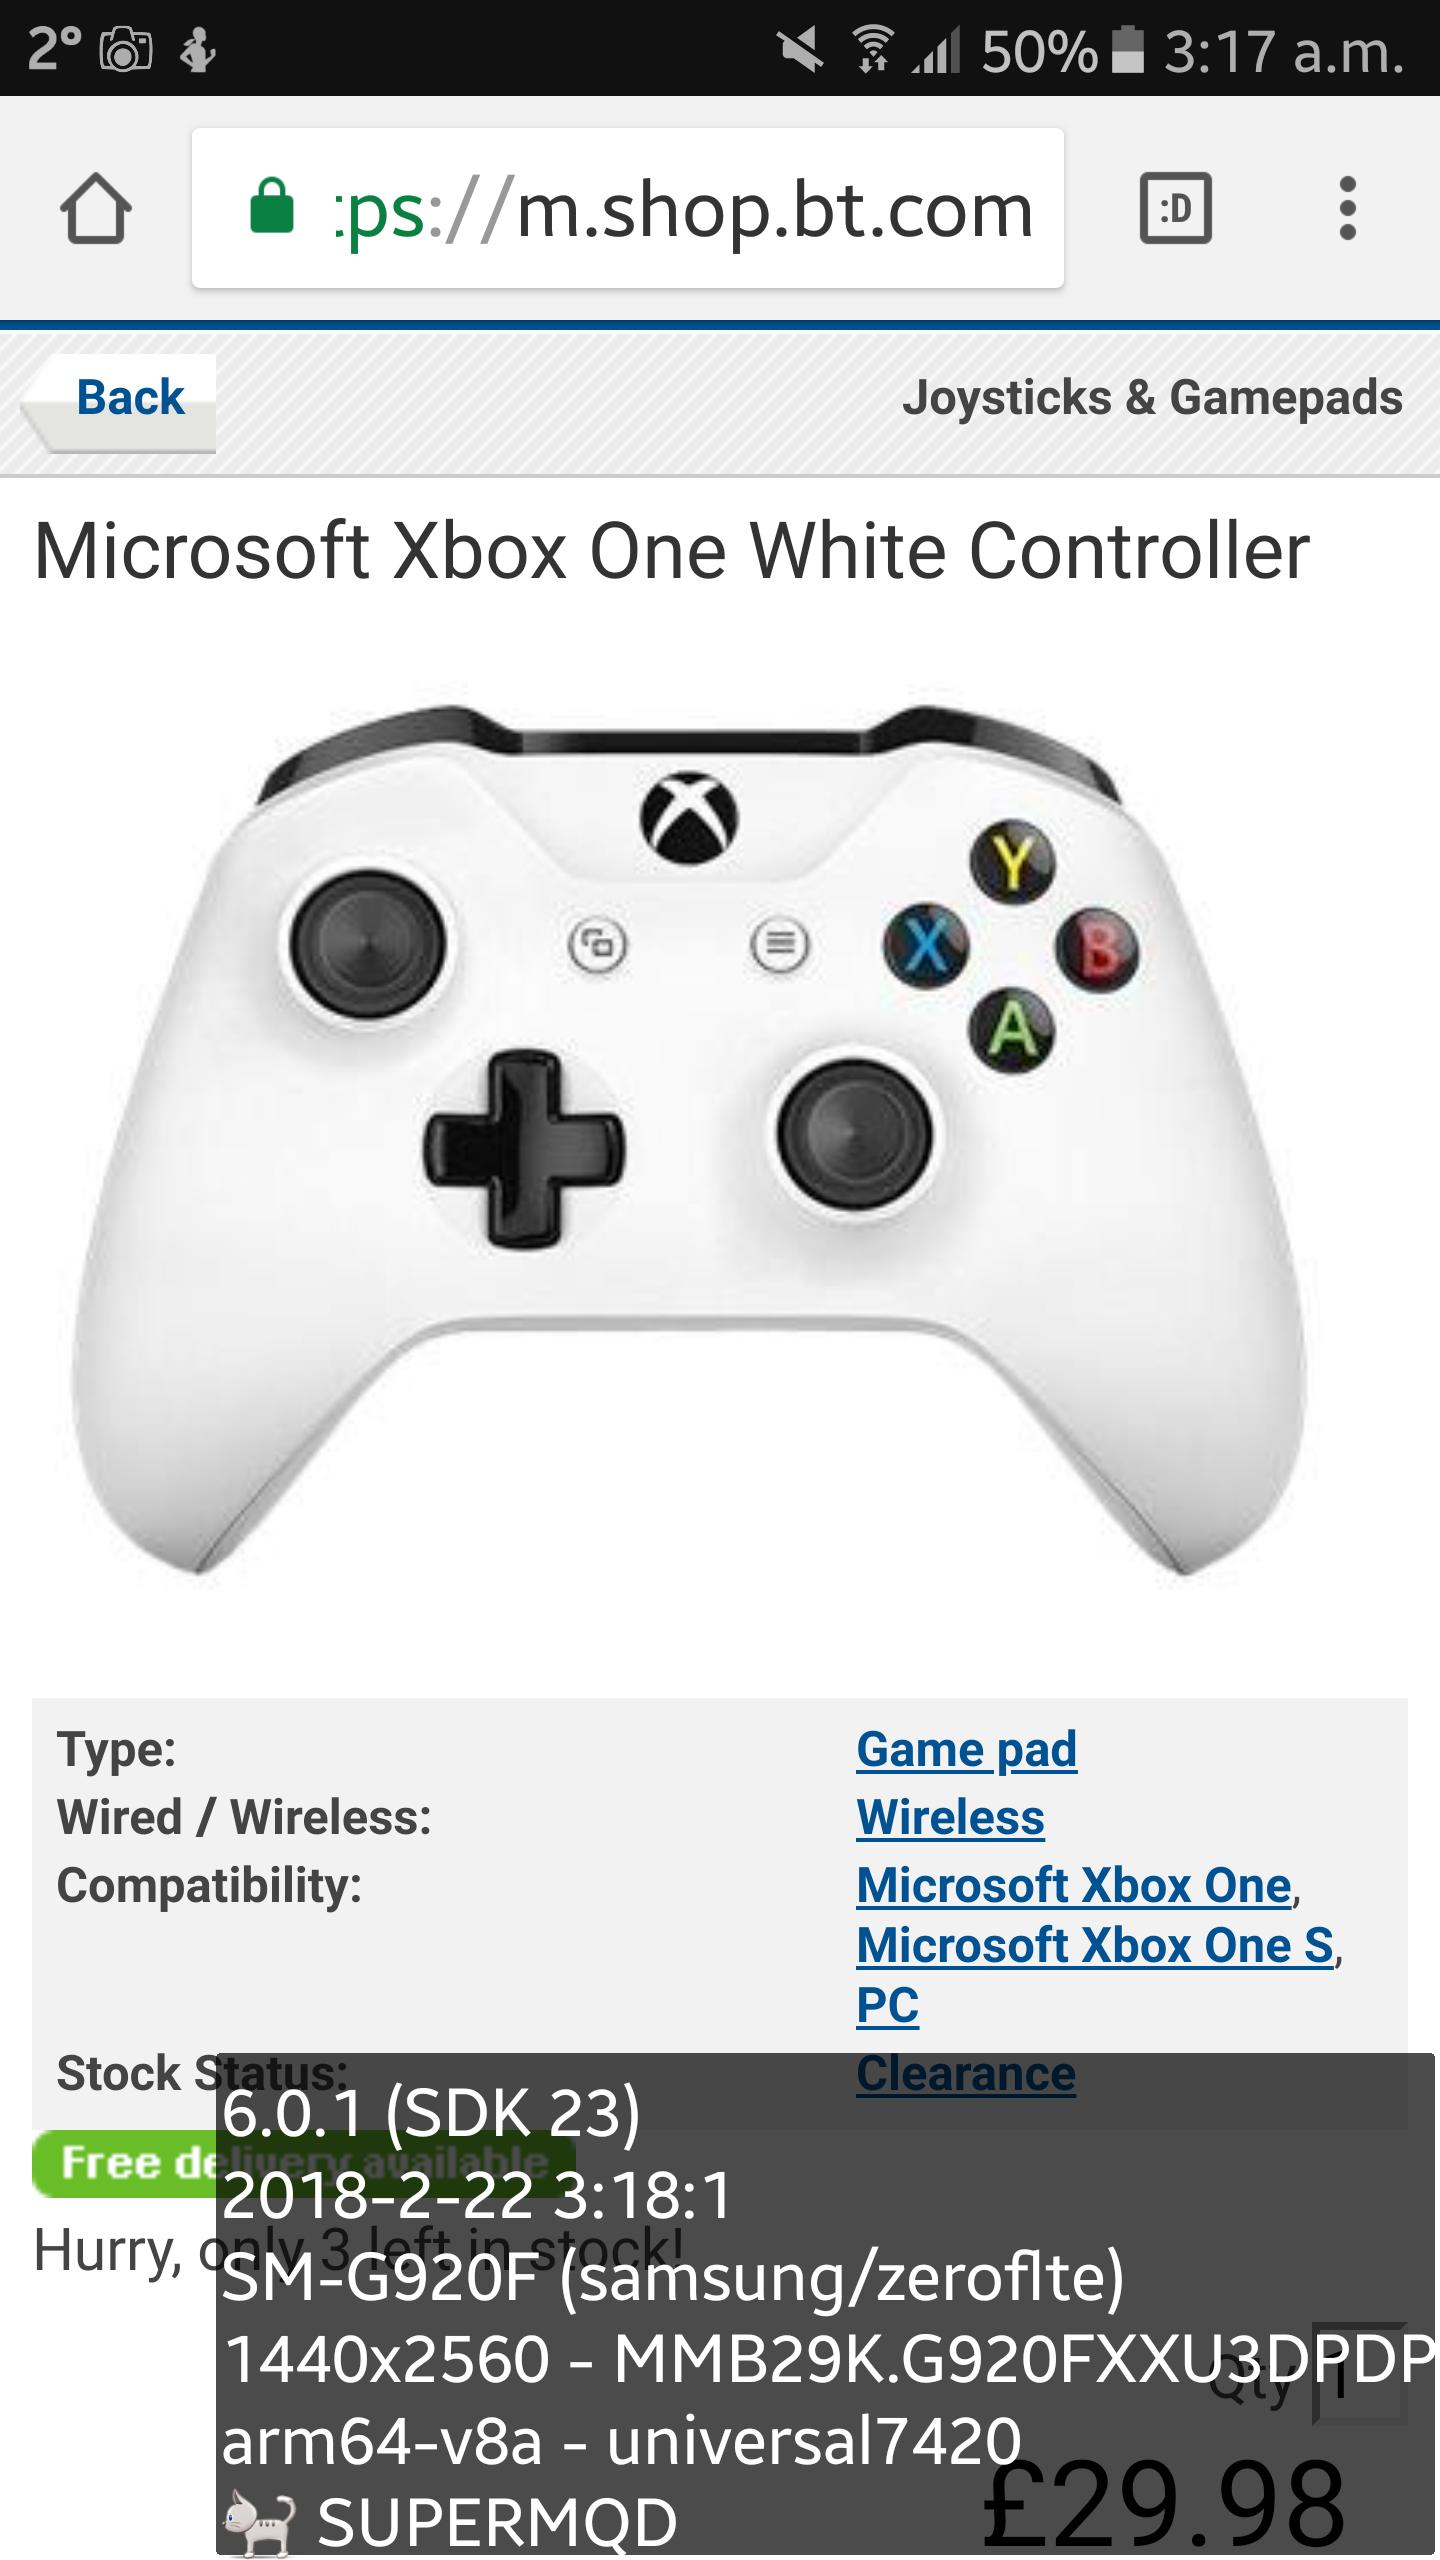 Microsoft Xbox One White Controller £29.98 @ BT SHOP